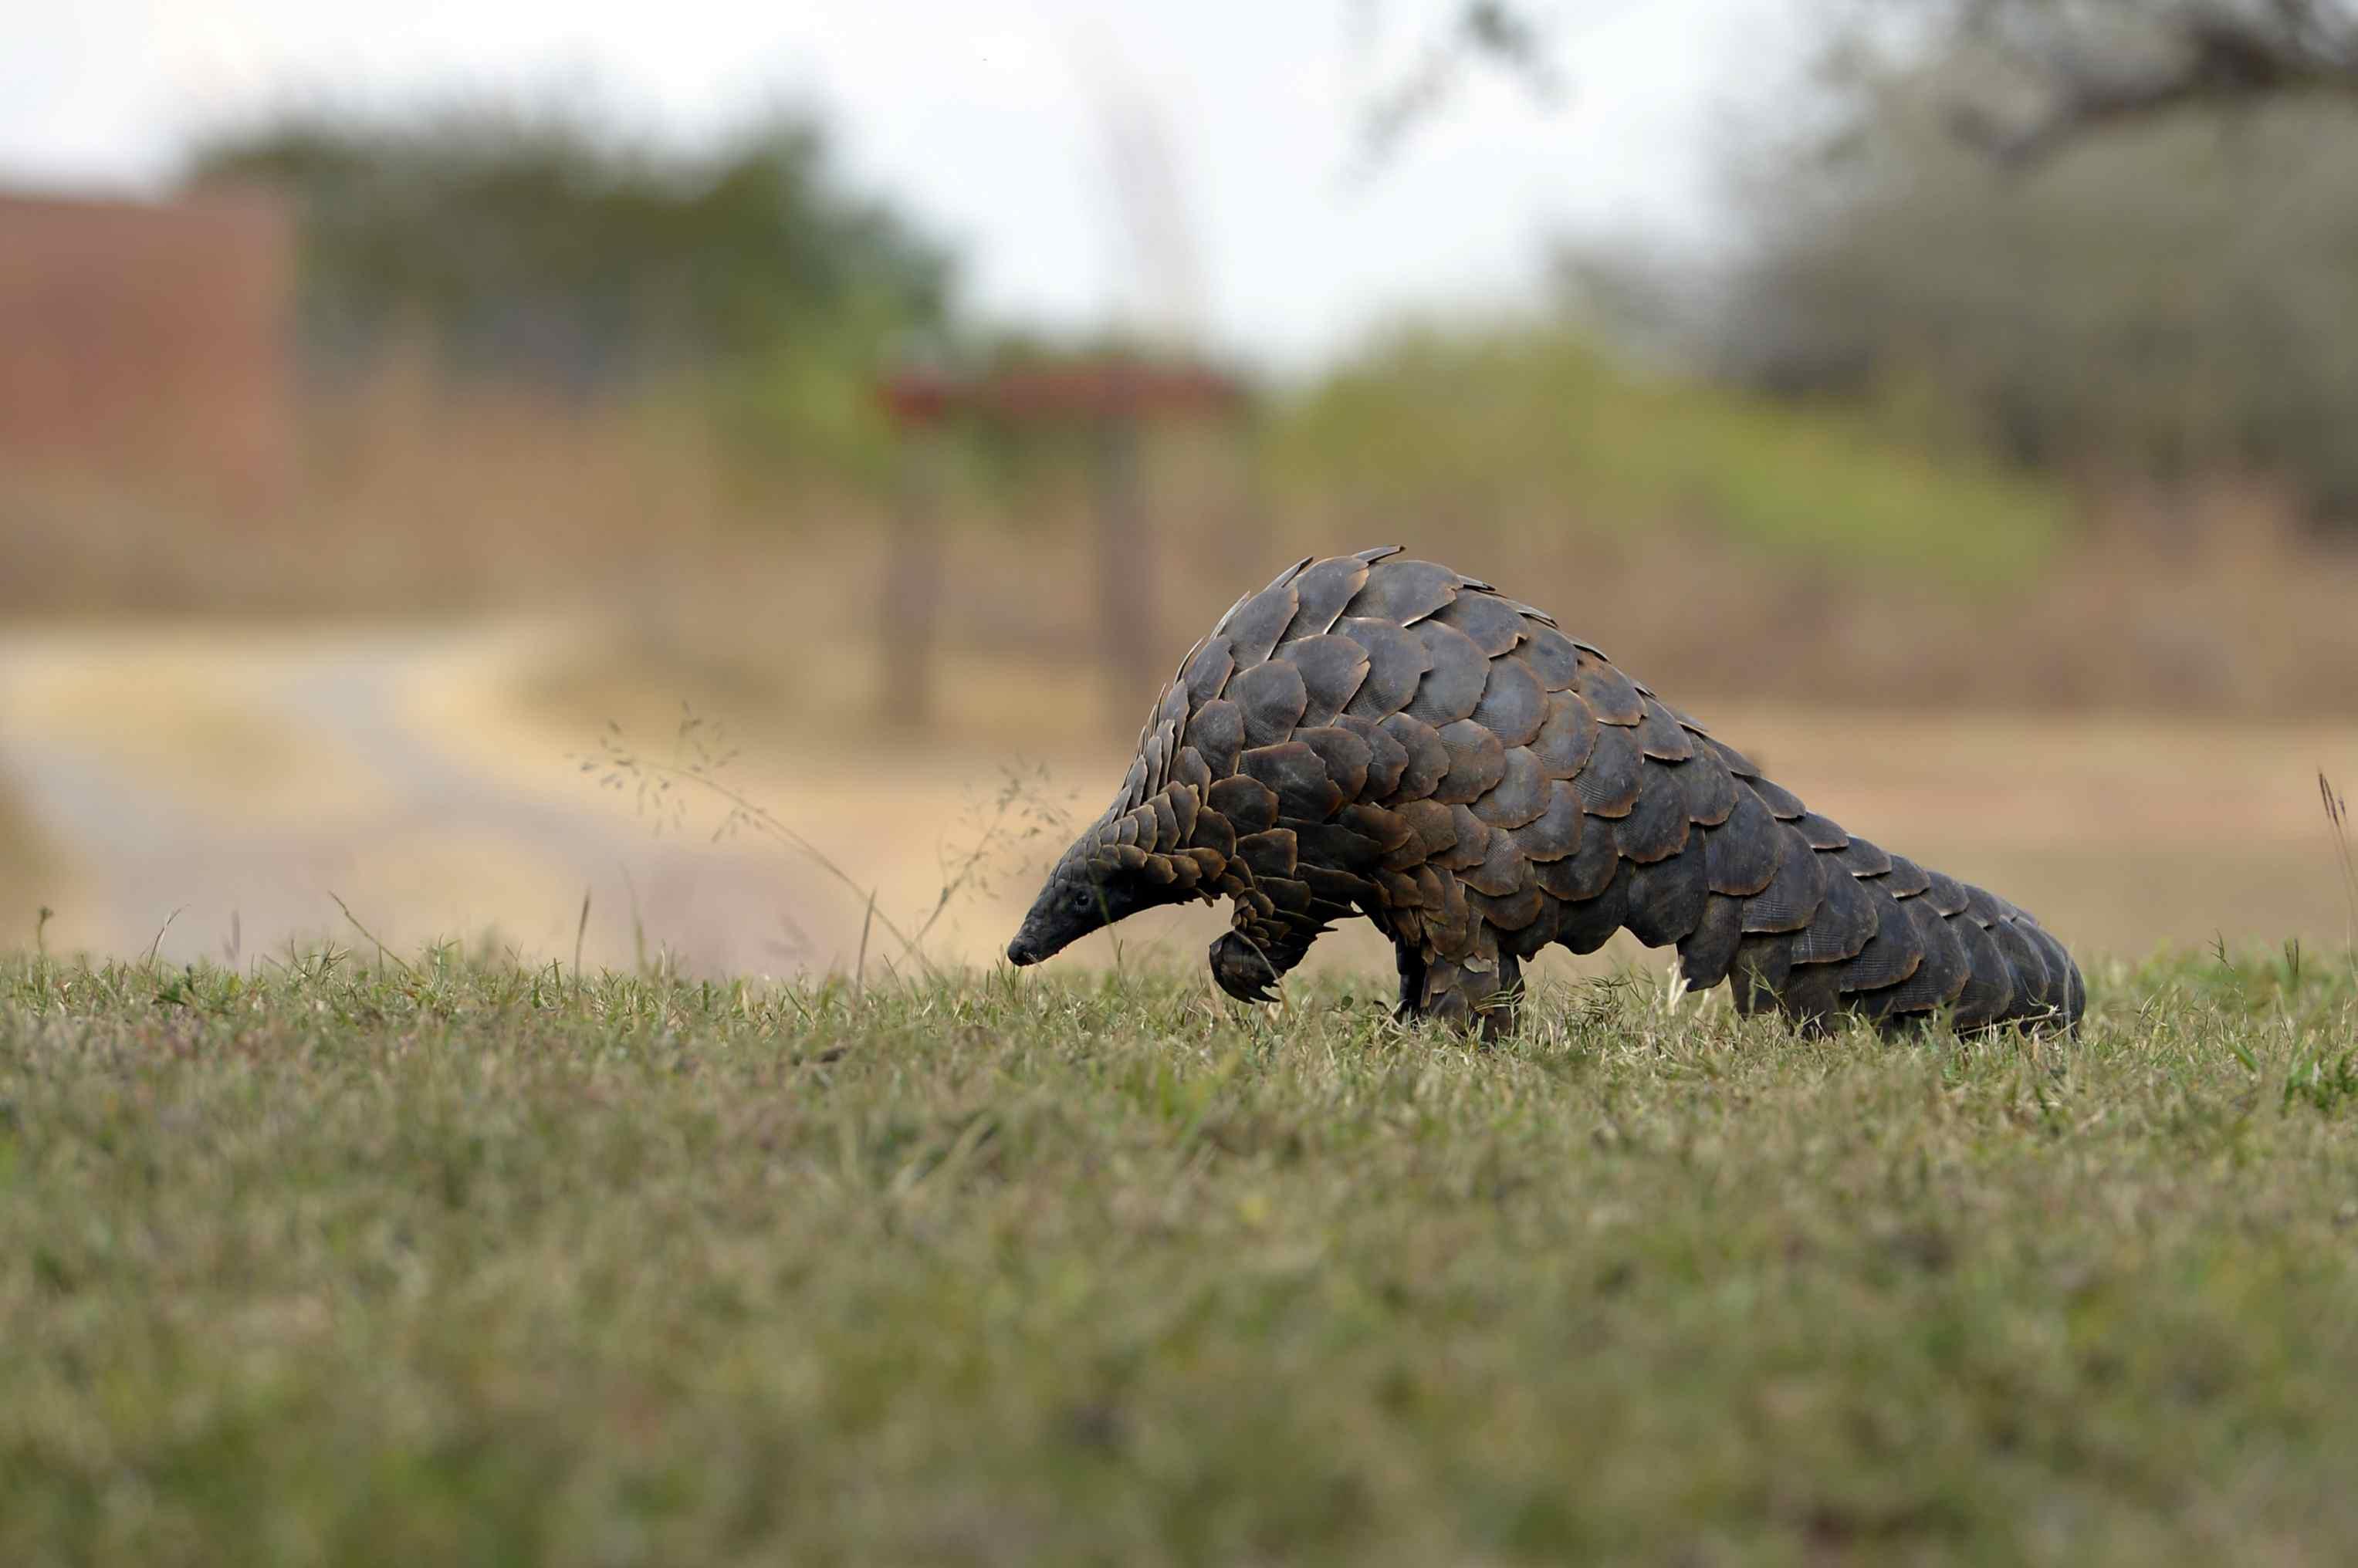 Pangolin in the grass walking near a road.